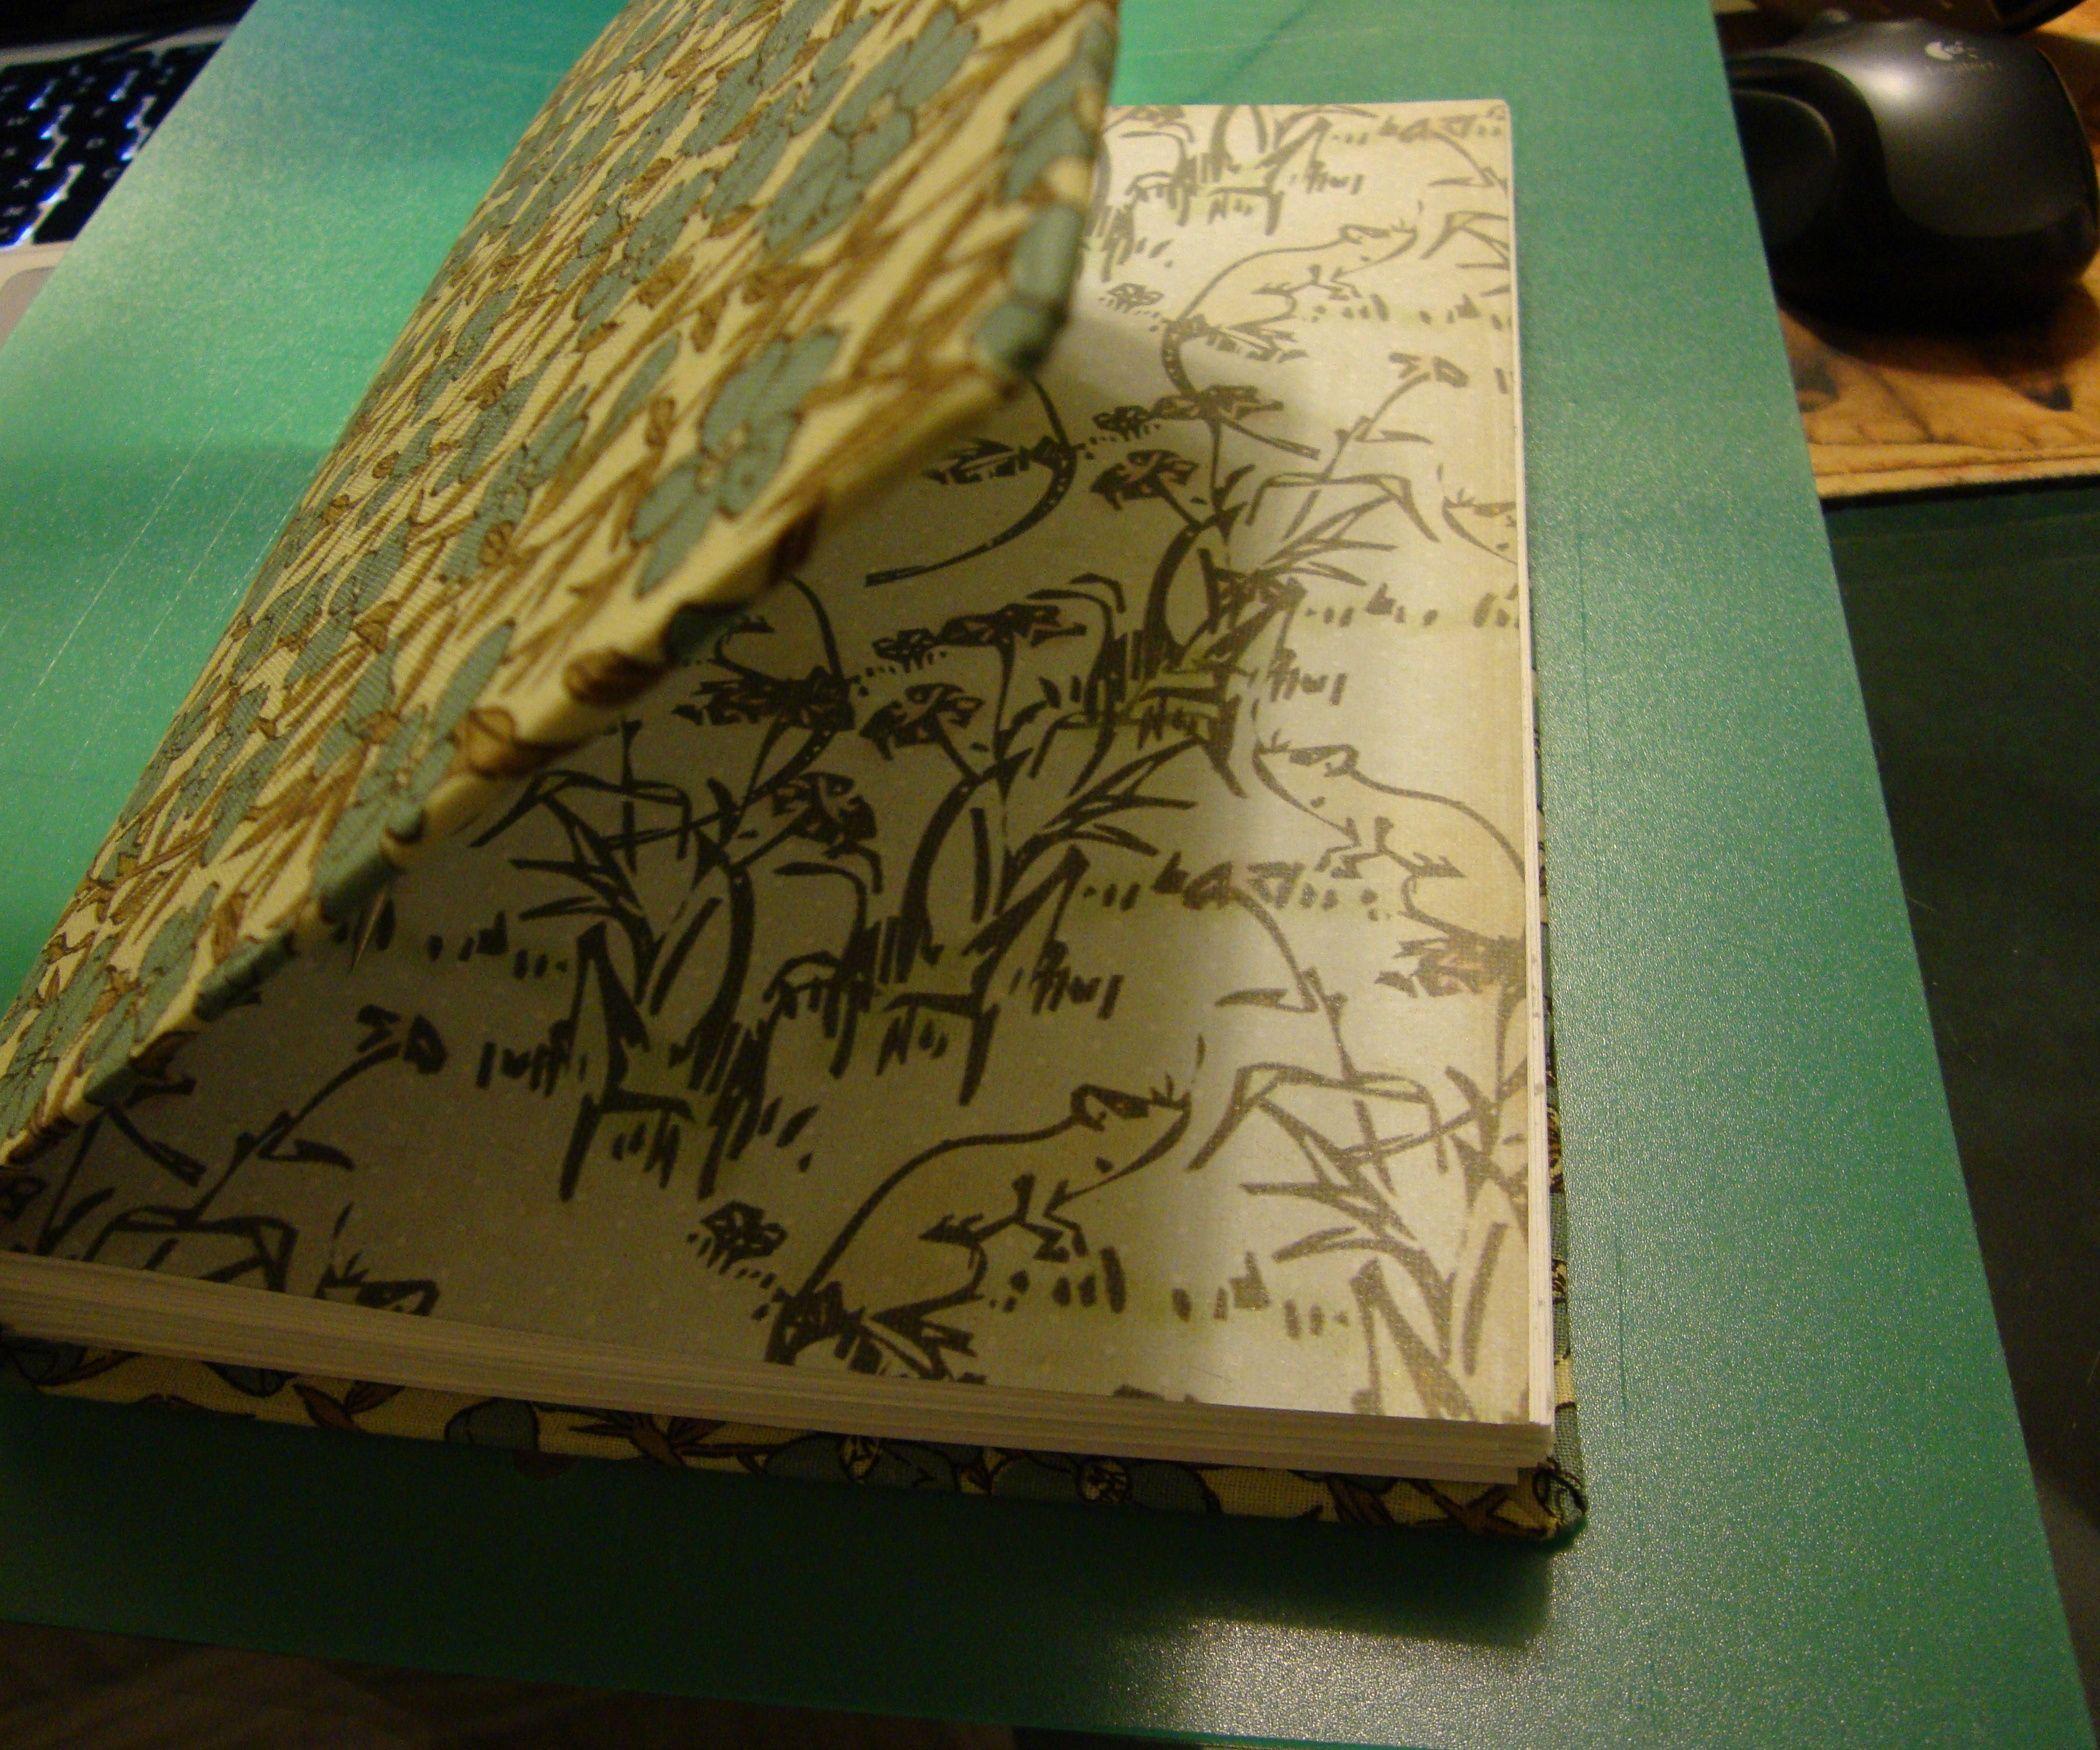 Bind your own book book binding methods woodworking